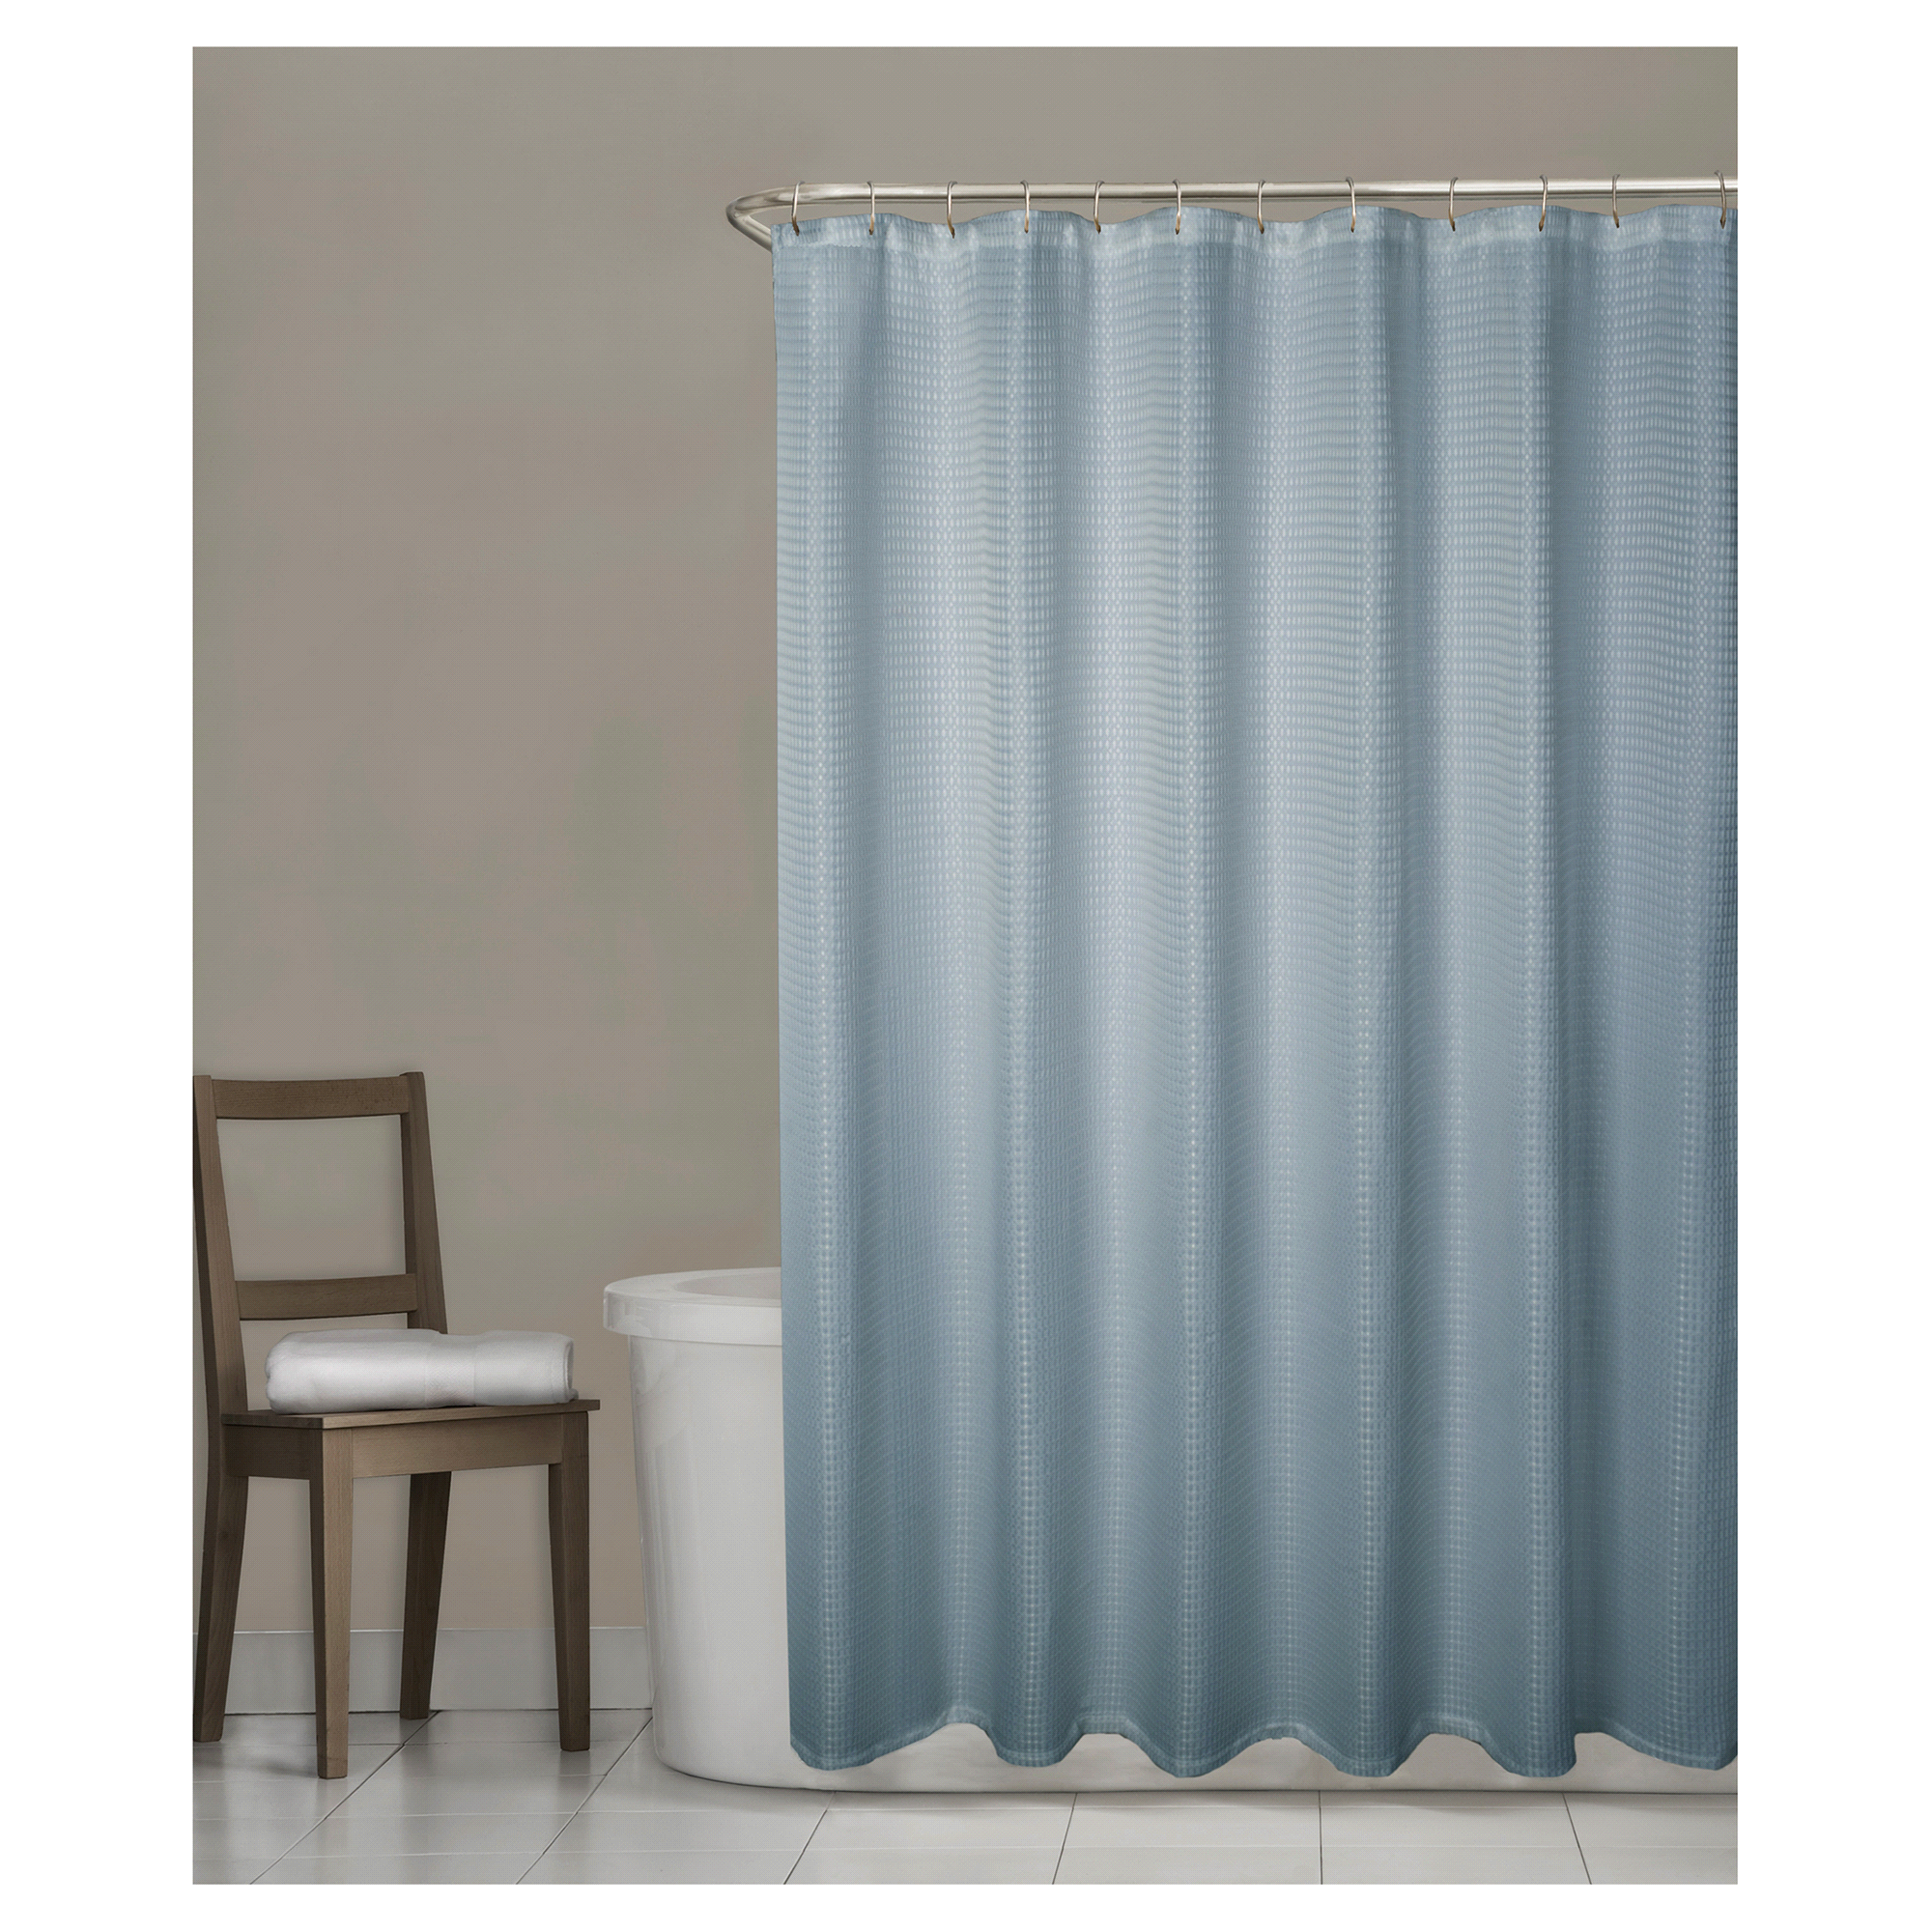 Clear fish shower curtain - Clear Fish Shower Curtain